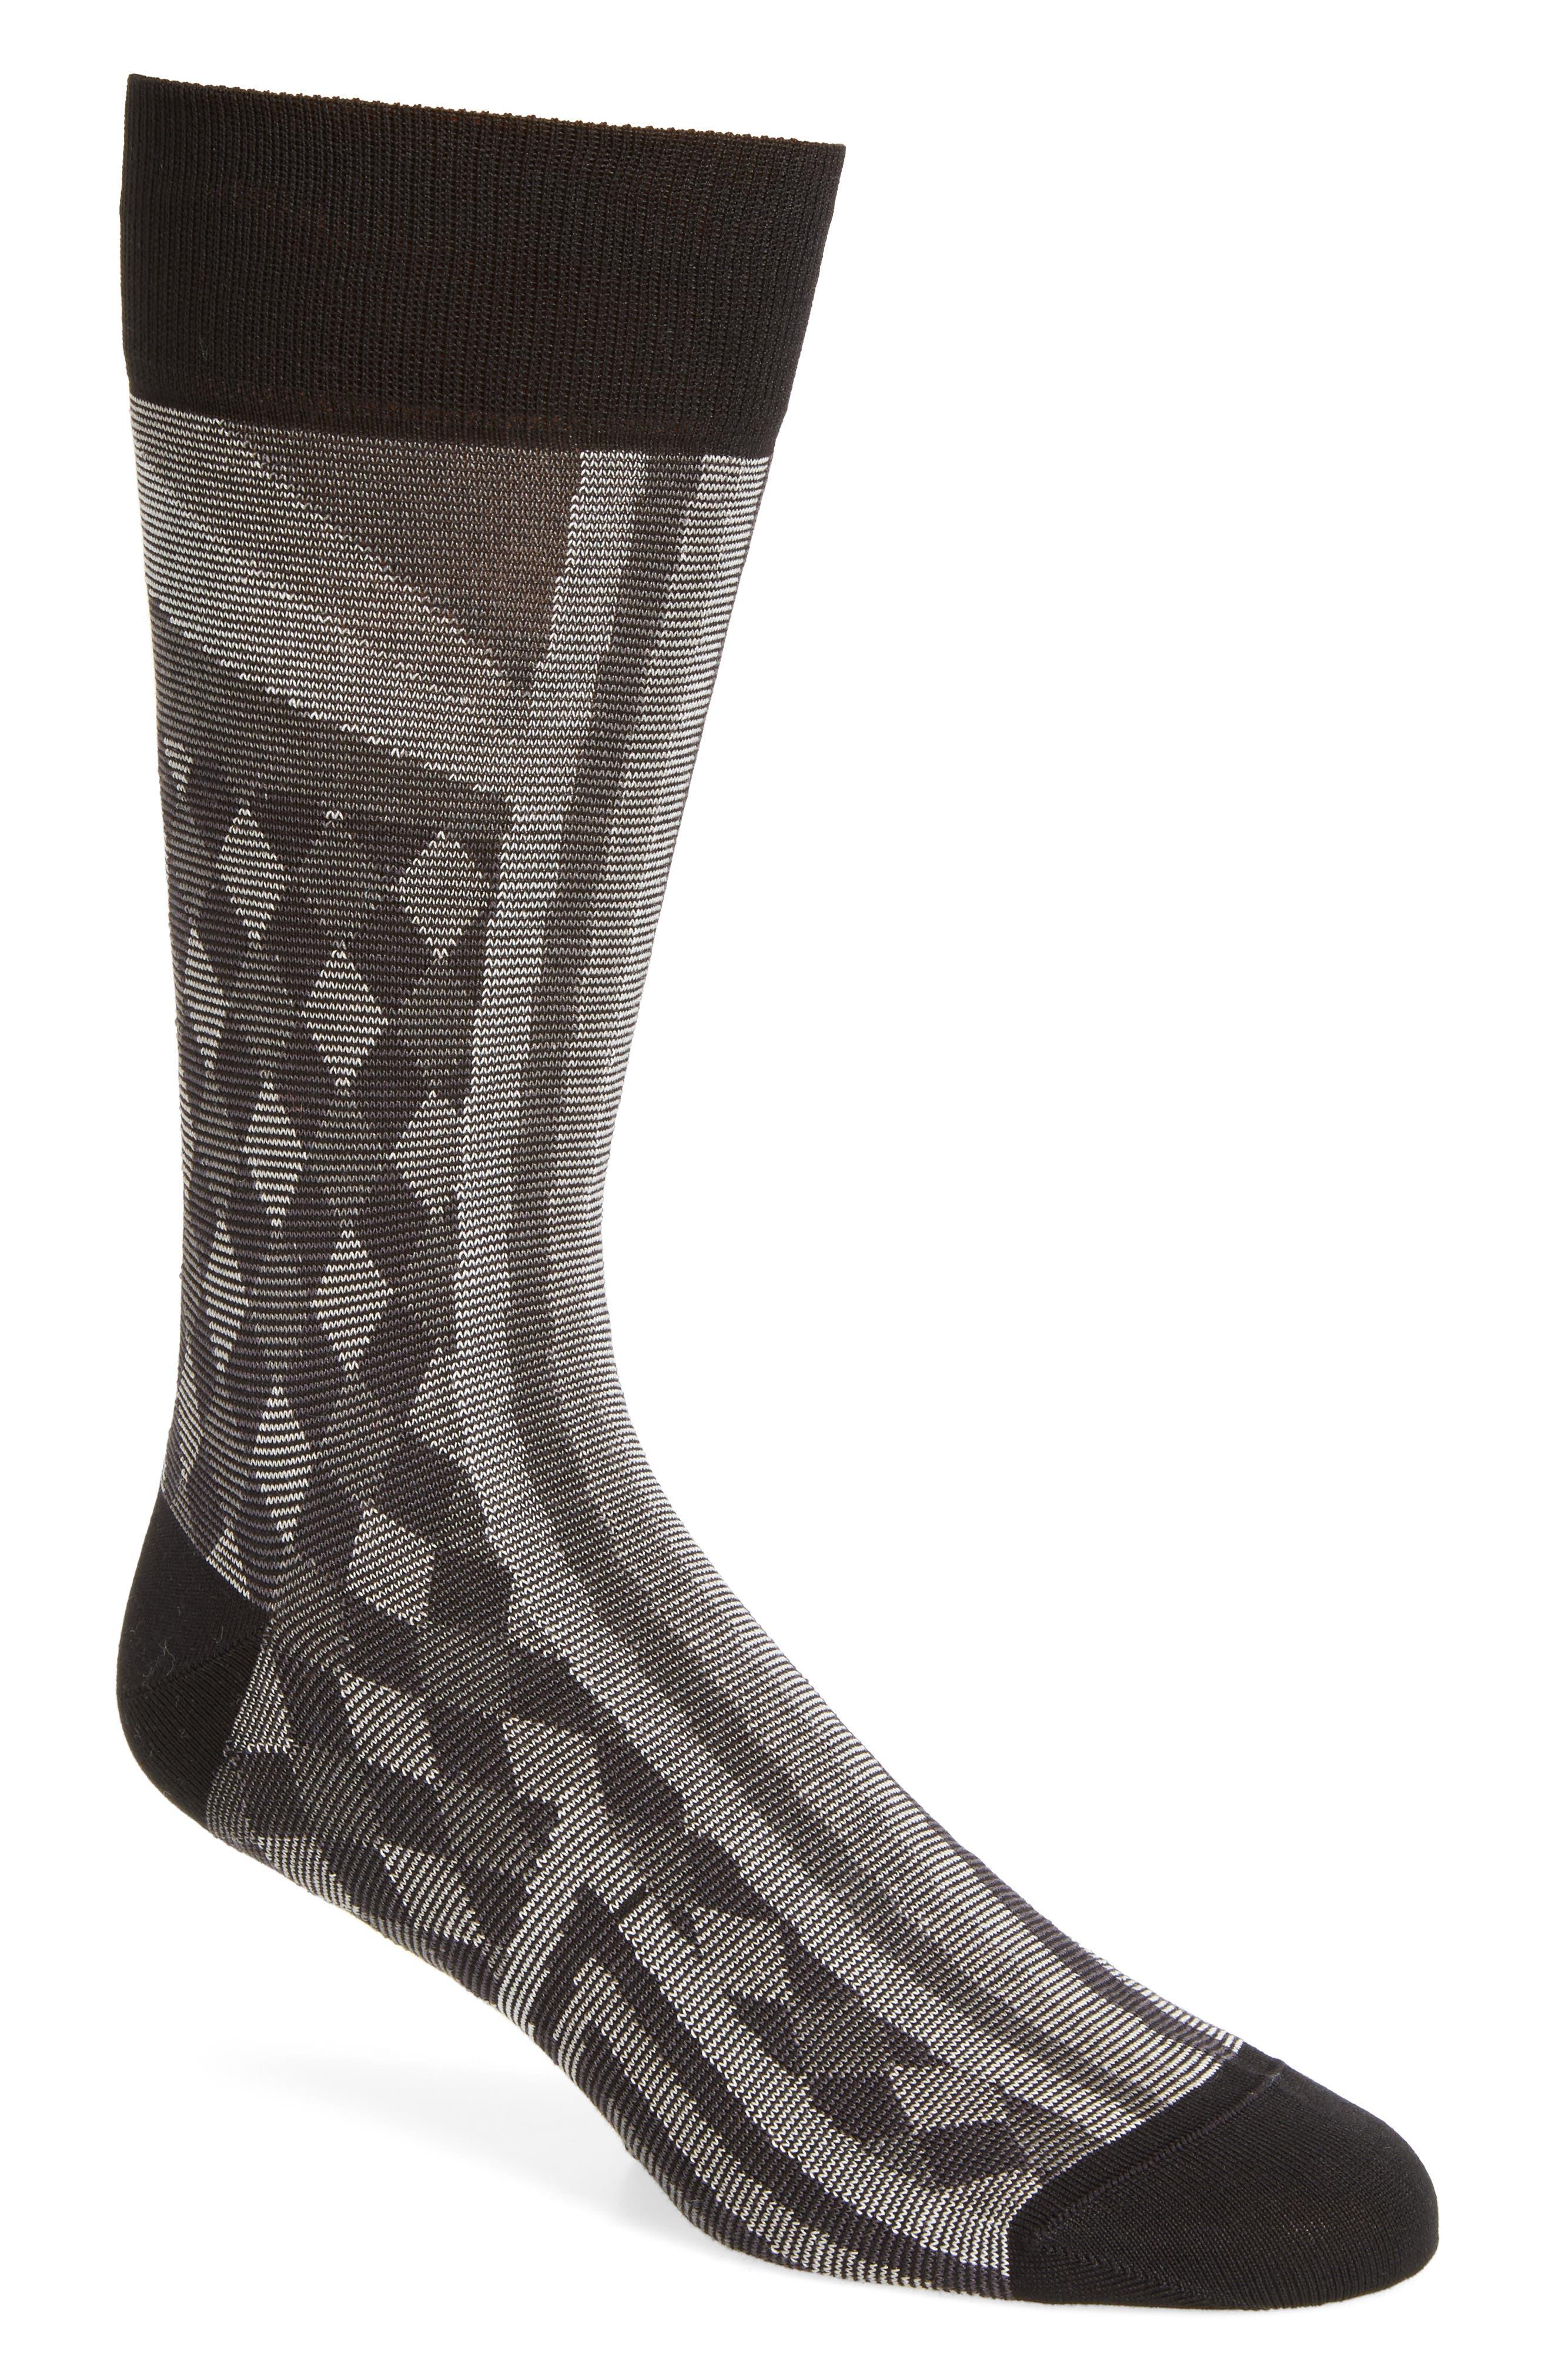 Main Image - Bugatchi Checks & Stripes Crew Socks